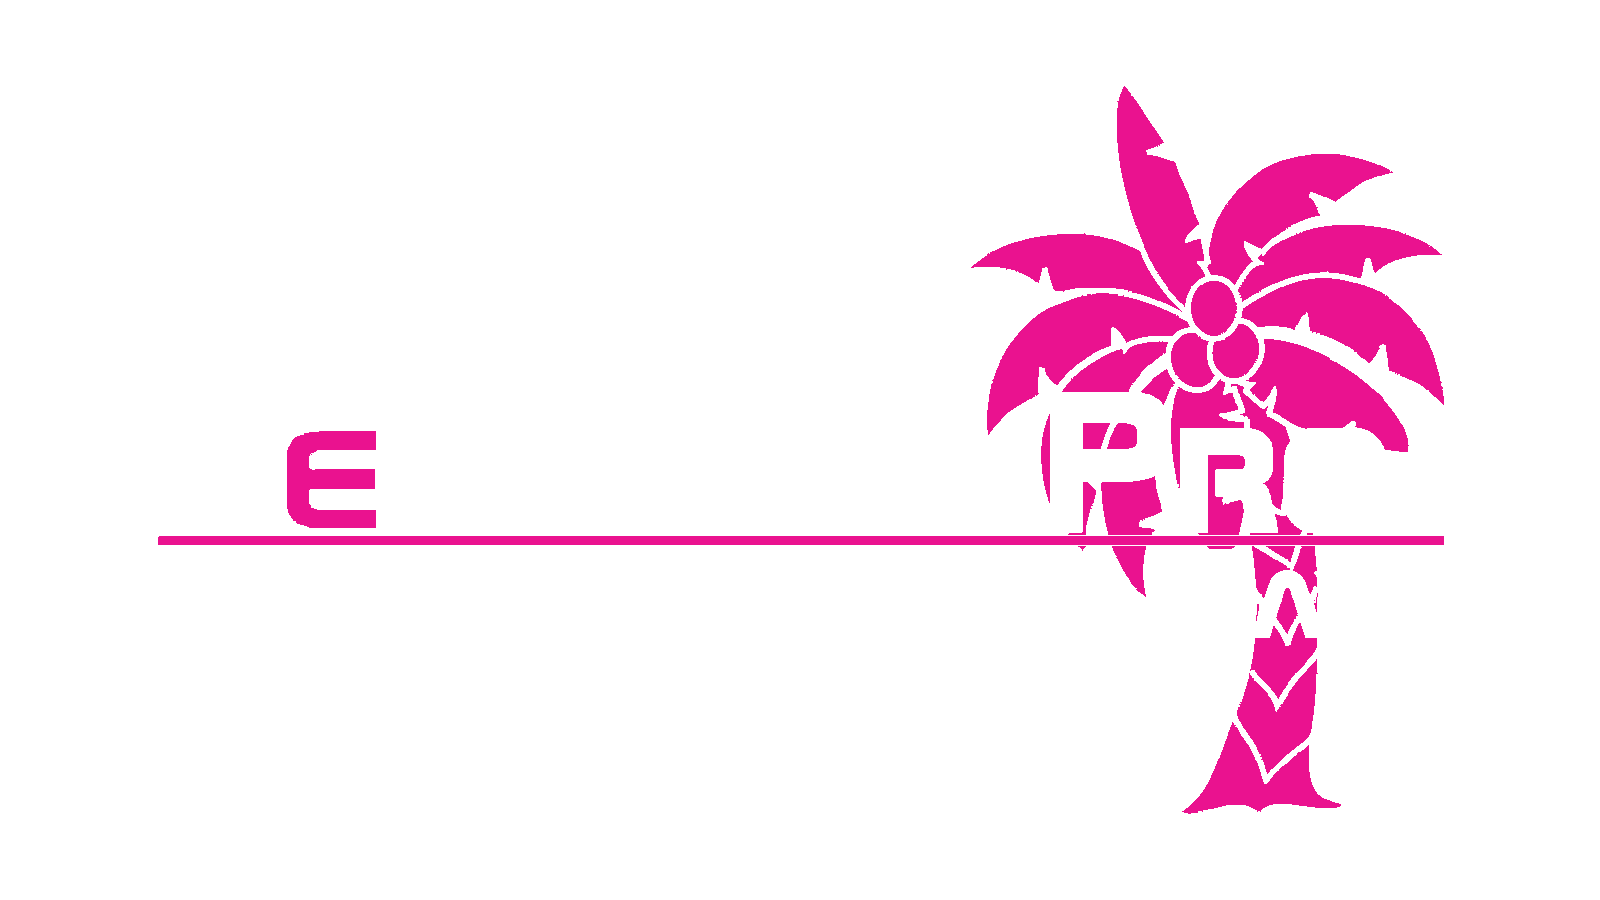 ceramic pro tampa bay logo